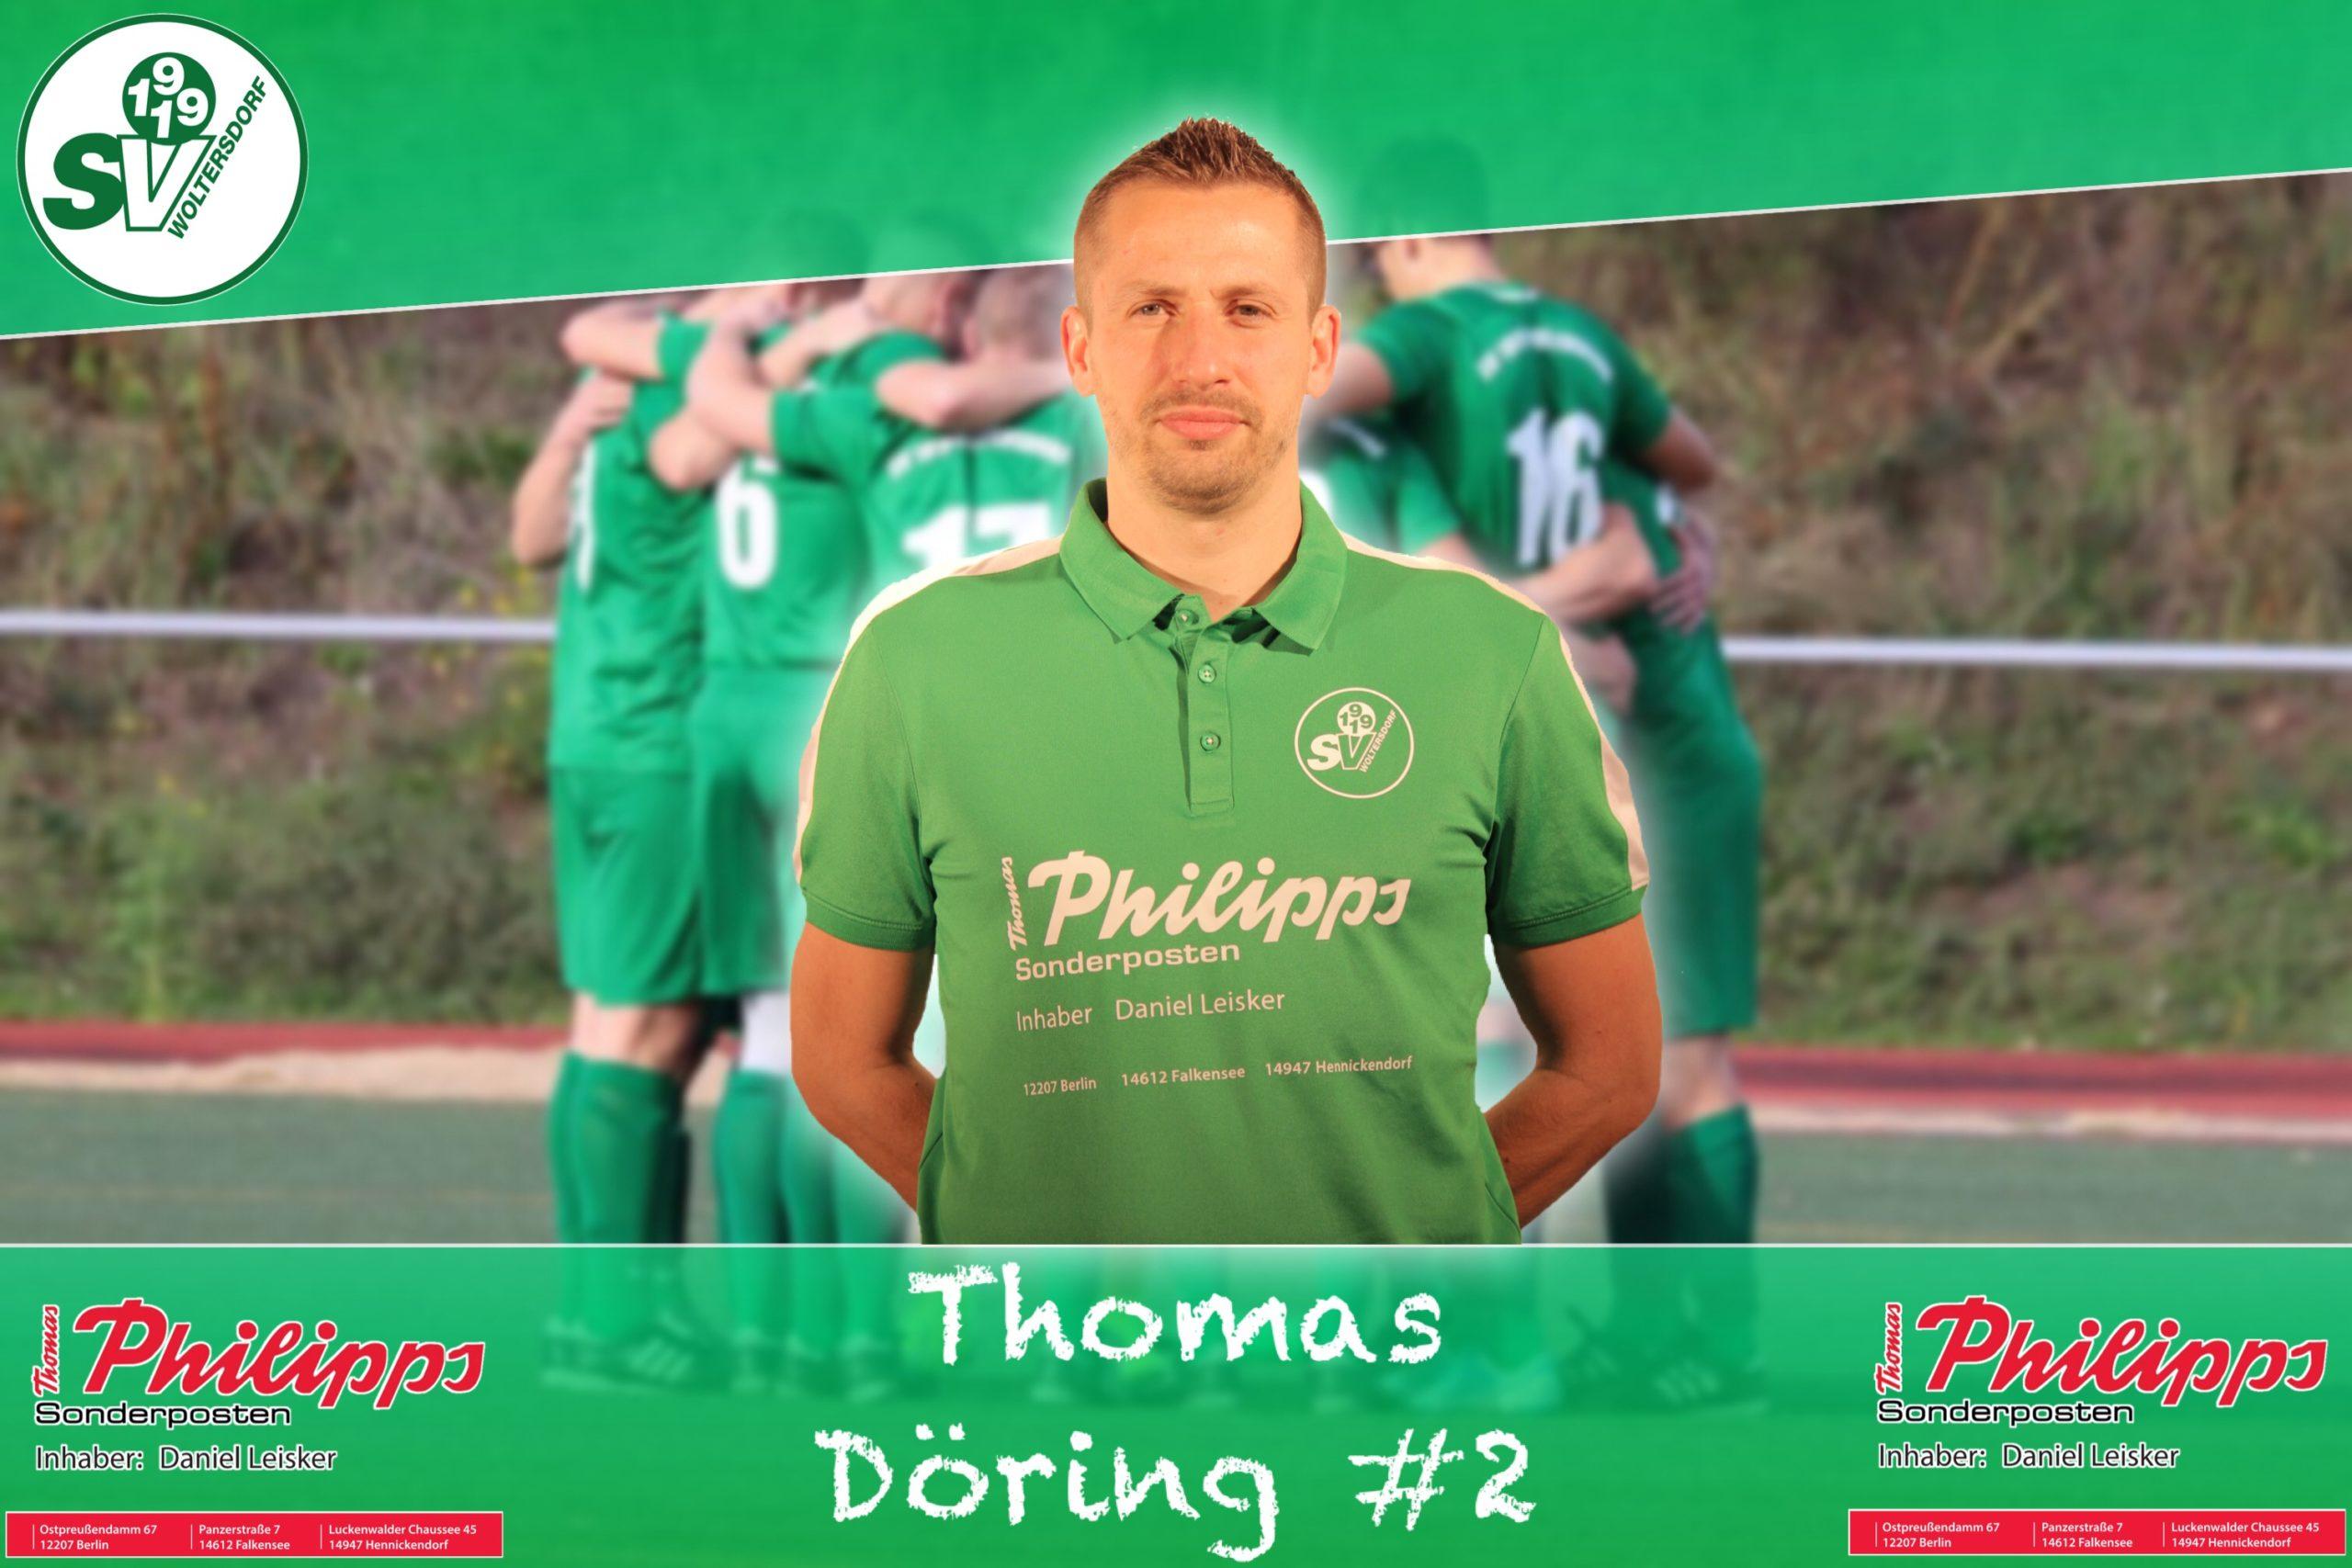 Thomas Döring